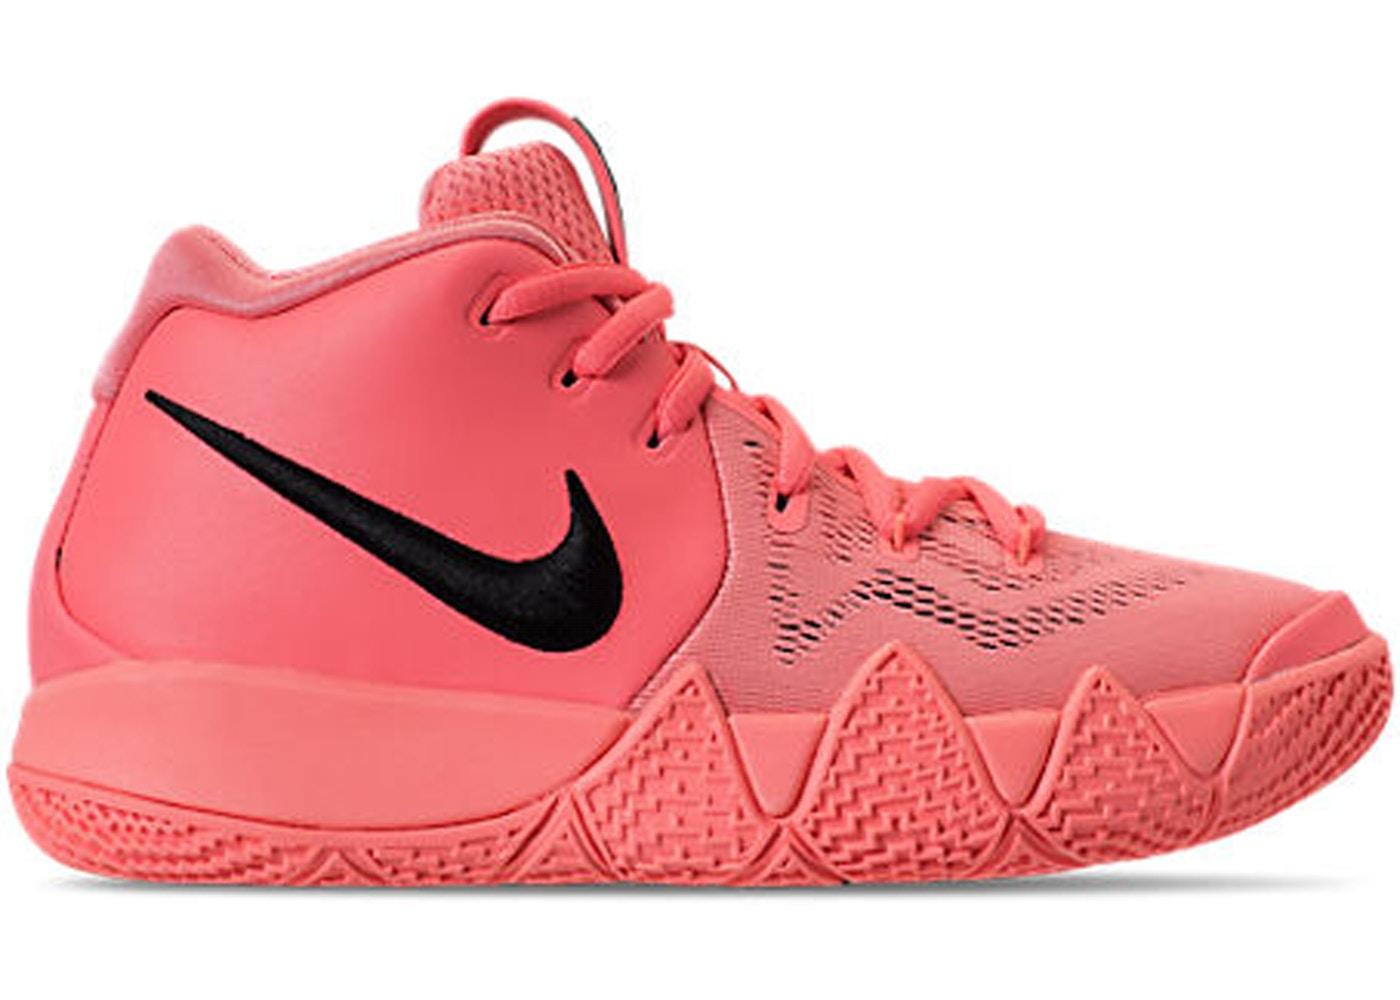 20b20e242696 Buy Nike Basketball Kyrie Shoes   Deadstock Sneakers